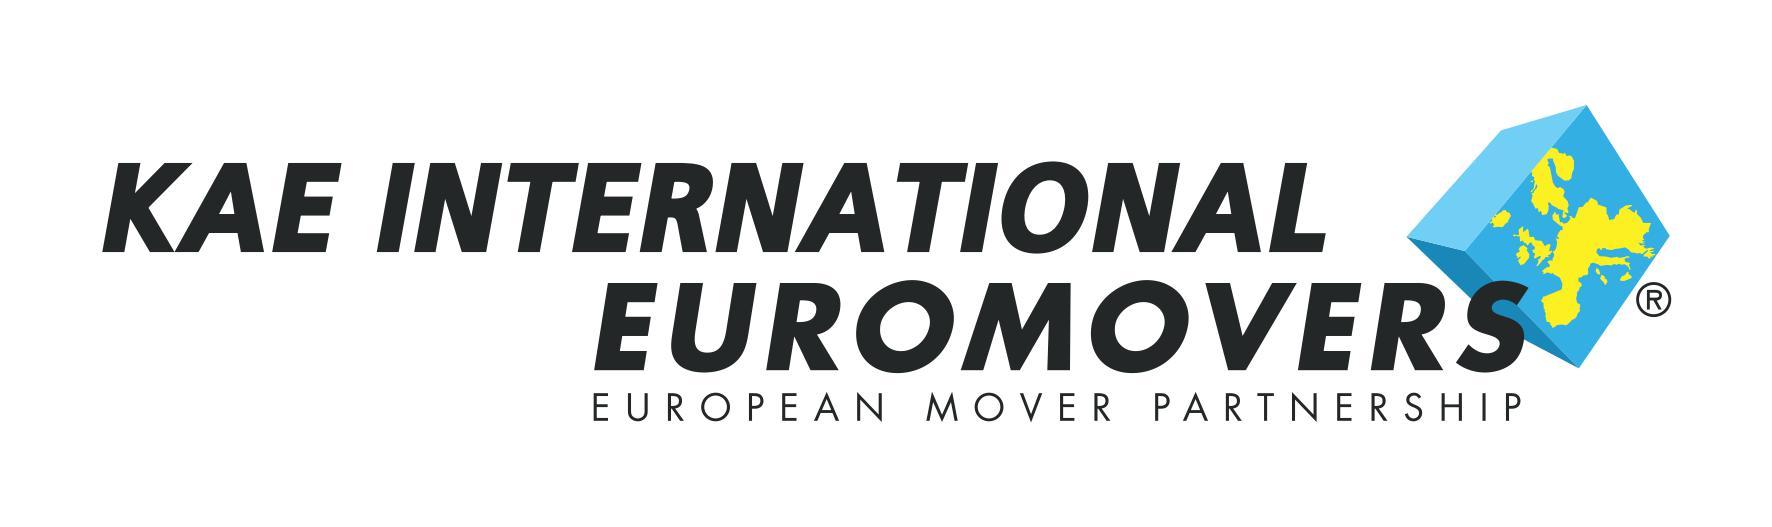 euromovers-parner-μετακομιση-μεταφορα-ανυψωτικα-μηχανηματα